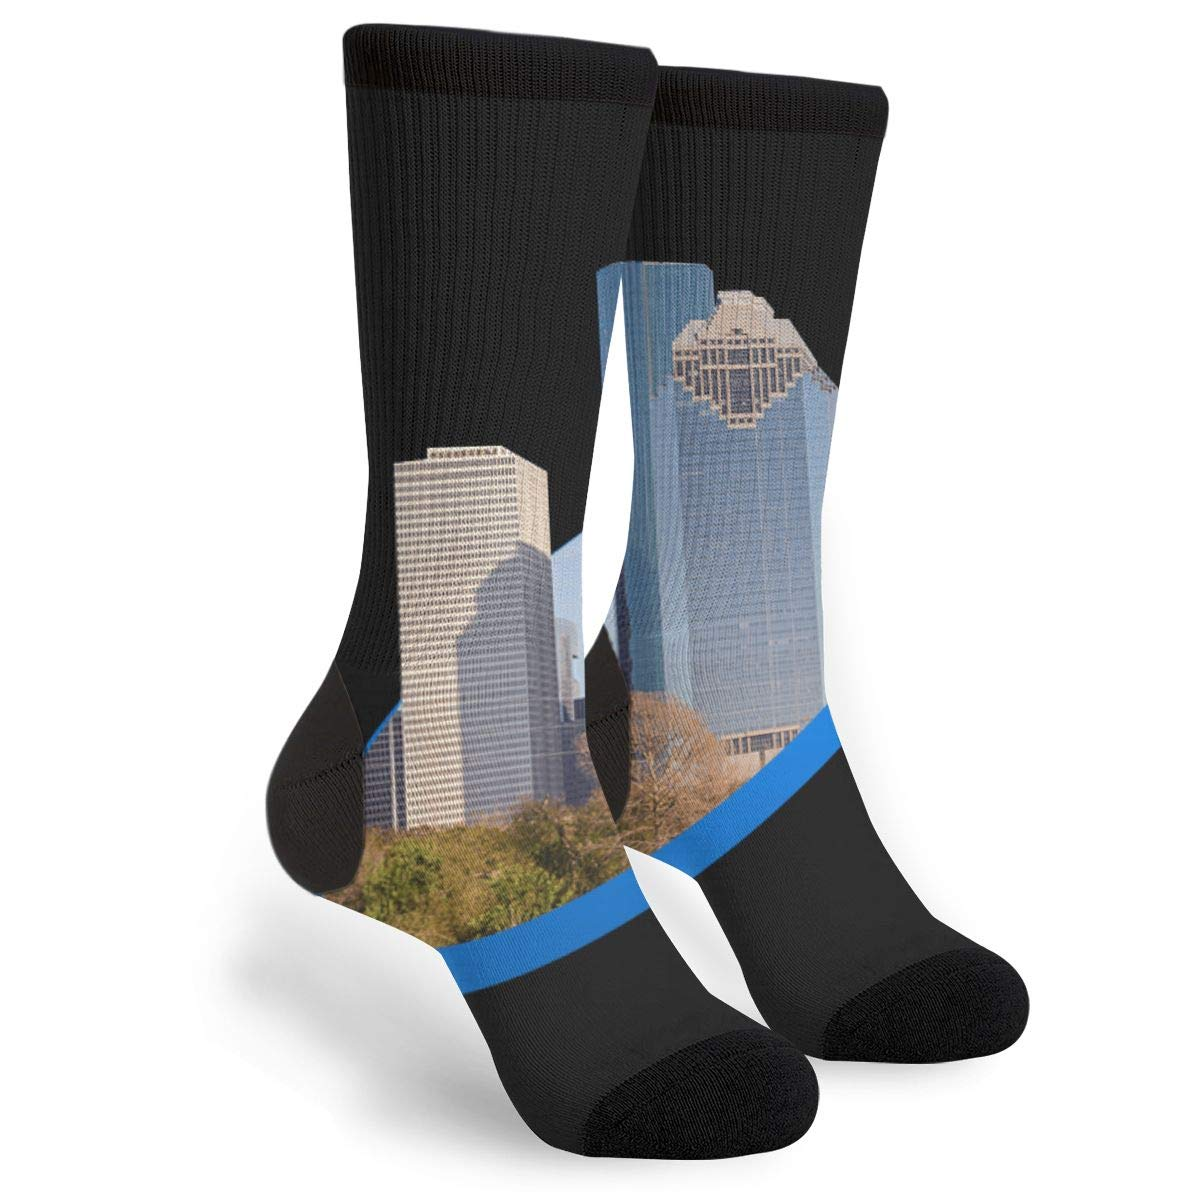 YISHOW Houston Texas Funny Crew Socks